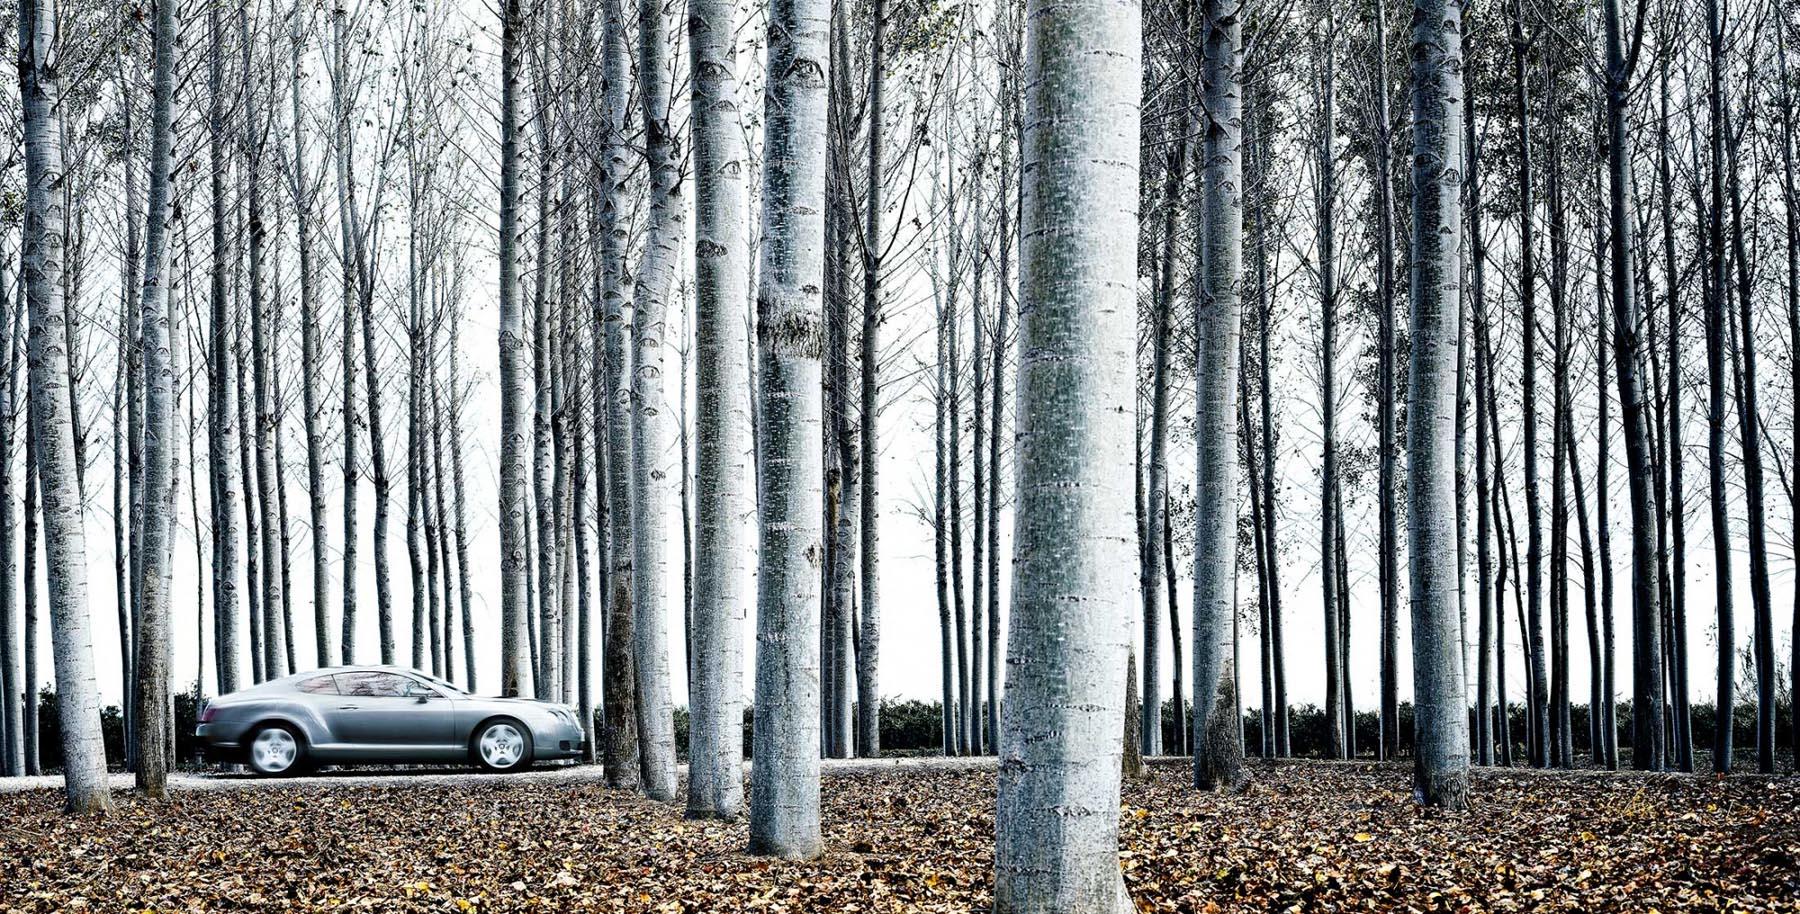 Nigel Harniman Silver Car & Silver Birch Trees